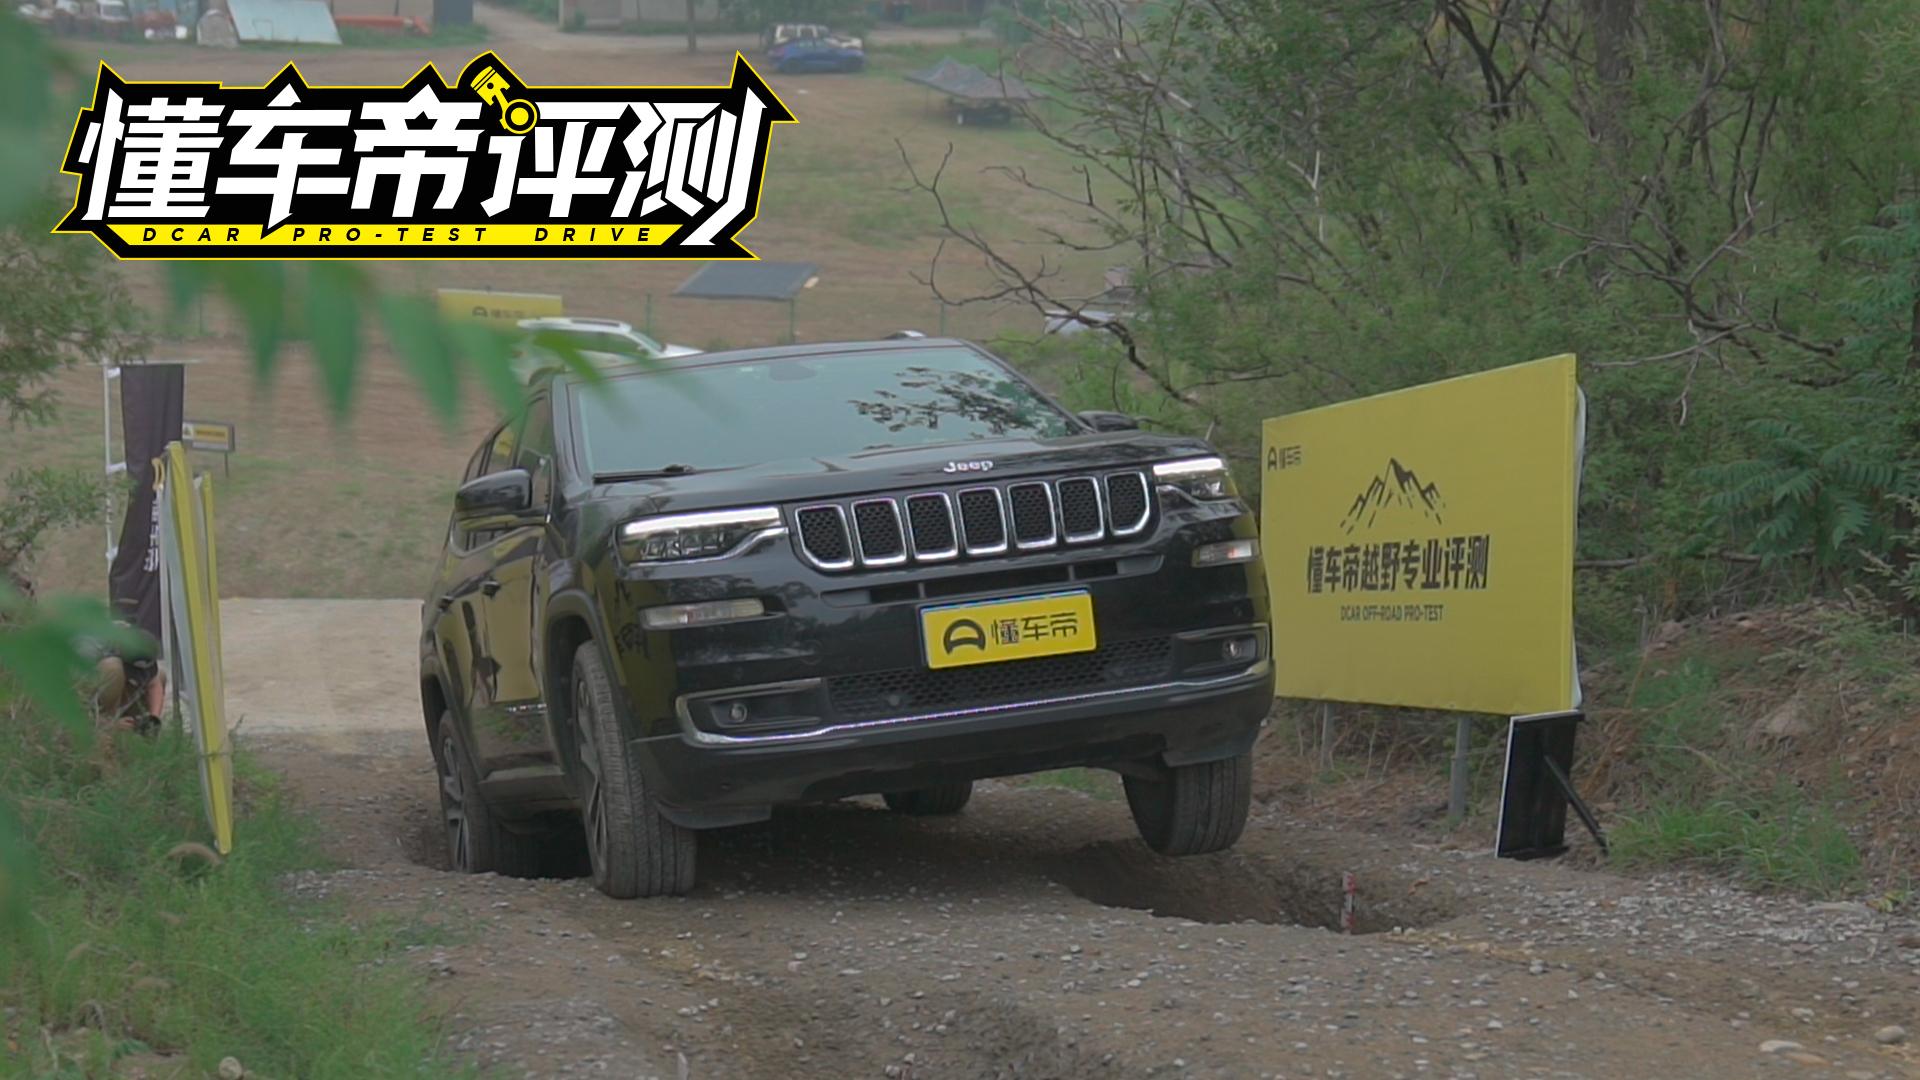 Jeep大指挥官销量低靡,是产品力不行还是压根没弄懂中国市场?